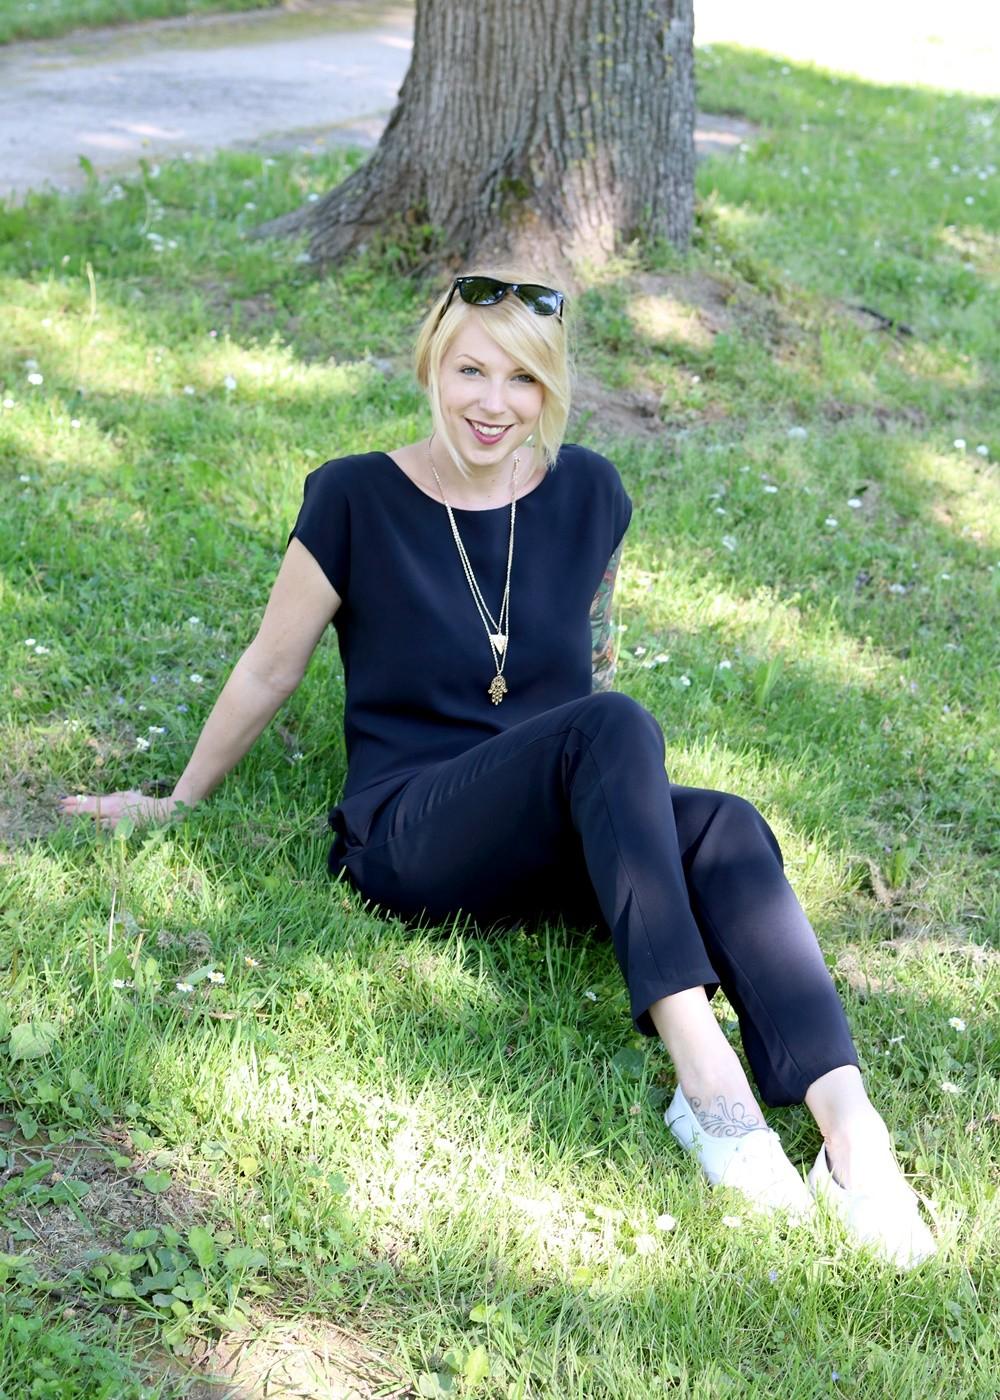 Fashionbloggerin Karlsruhe Outfit Jumpsuit Aldi Jette Joop Daniel Wellington Dapper (20)